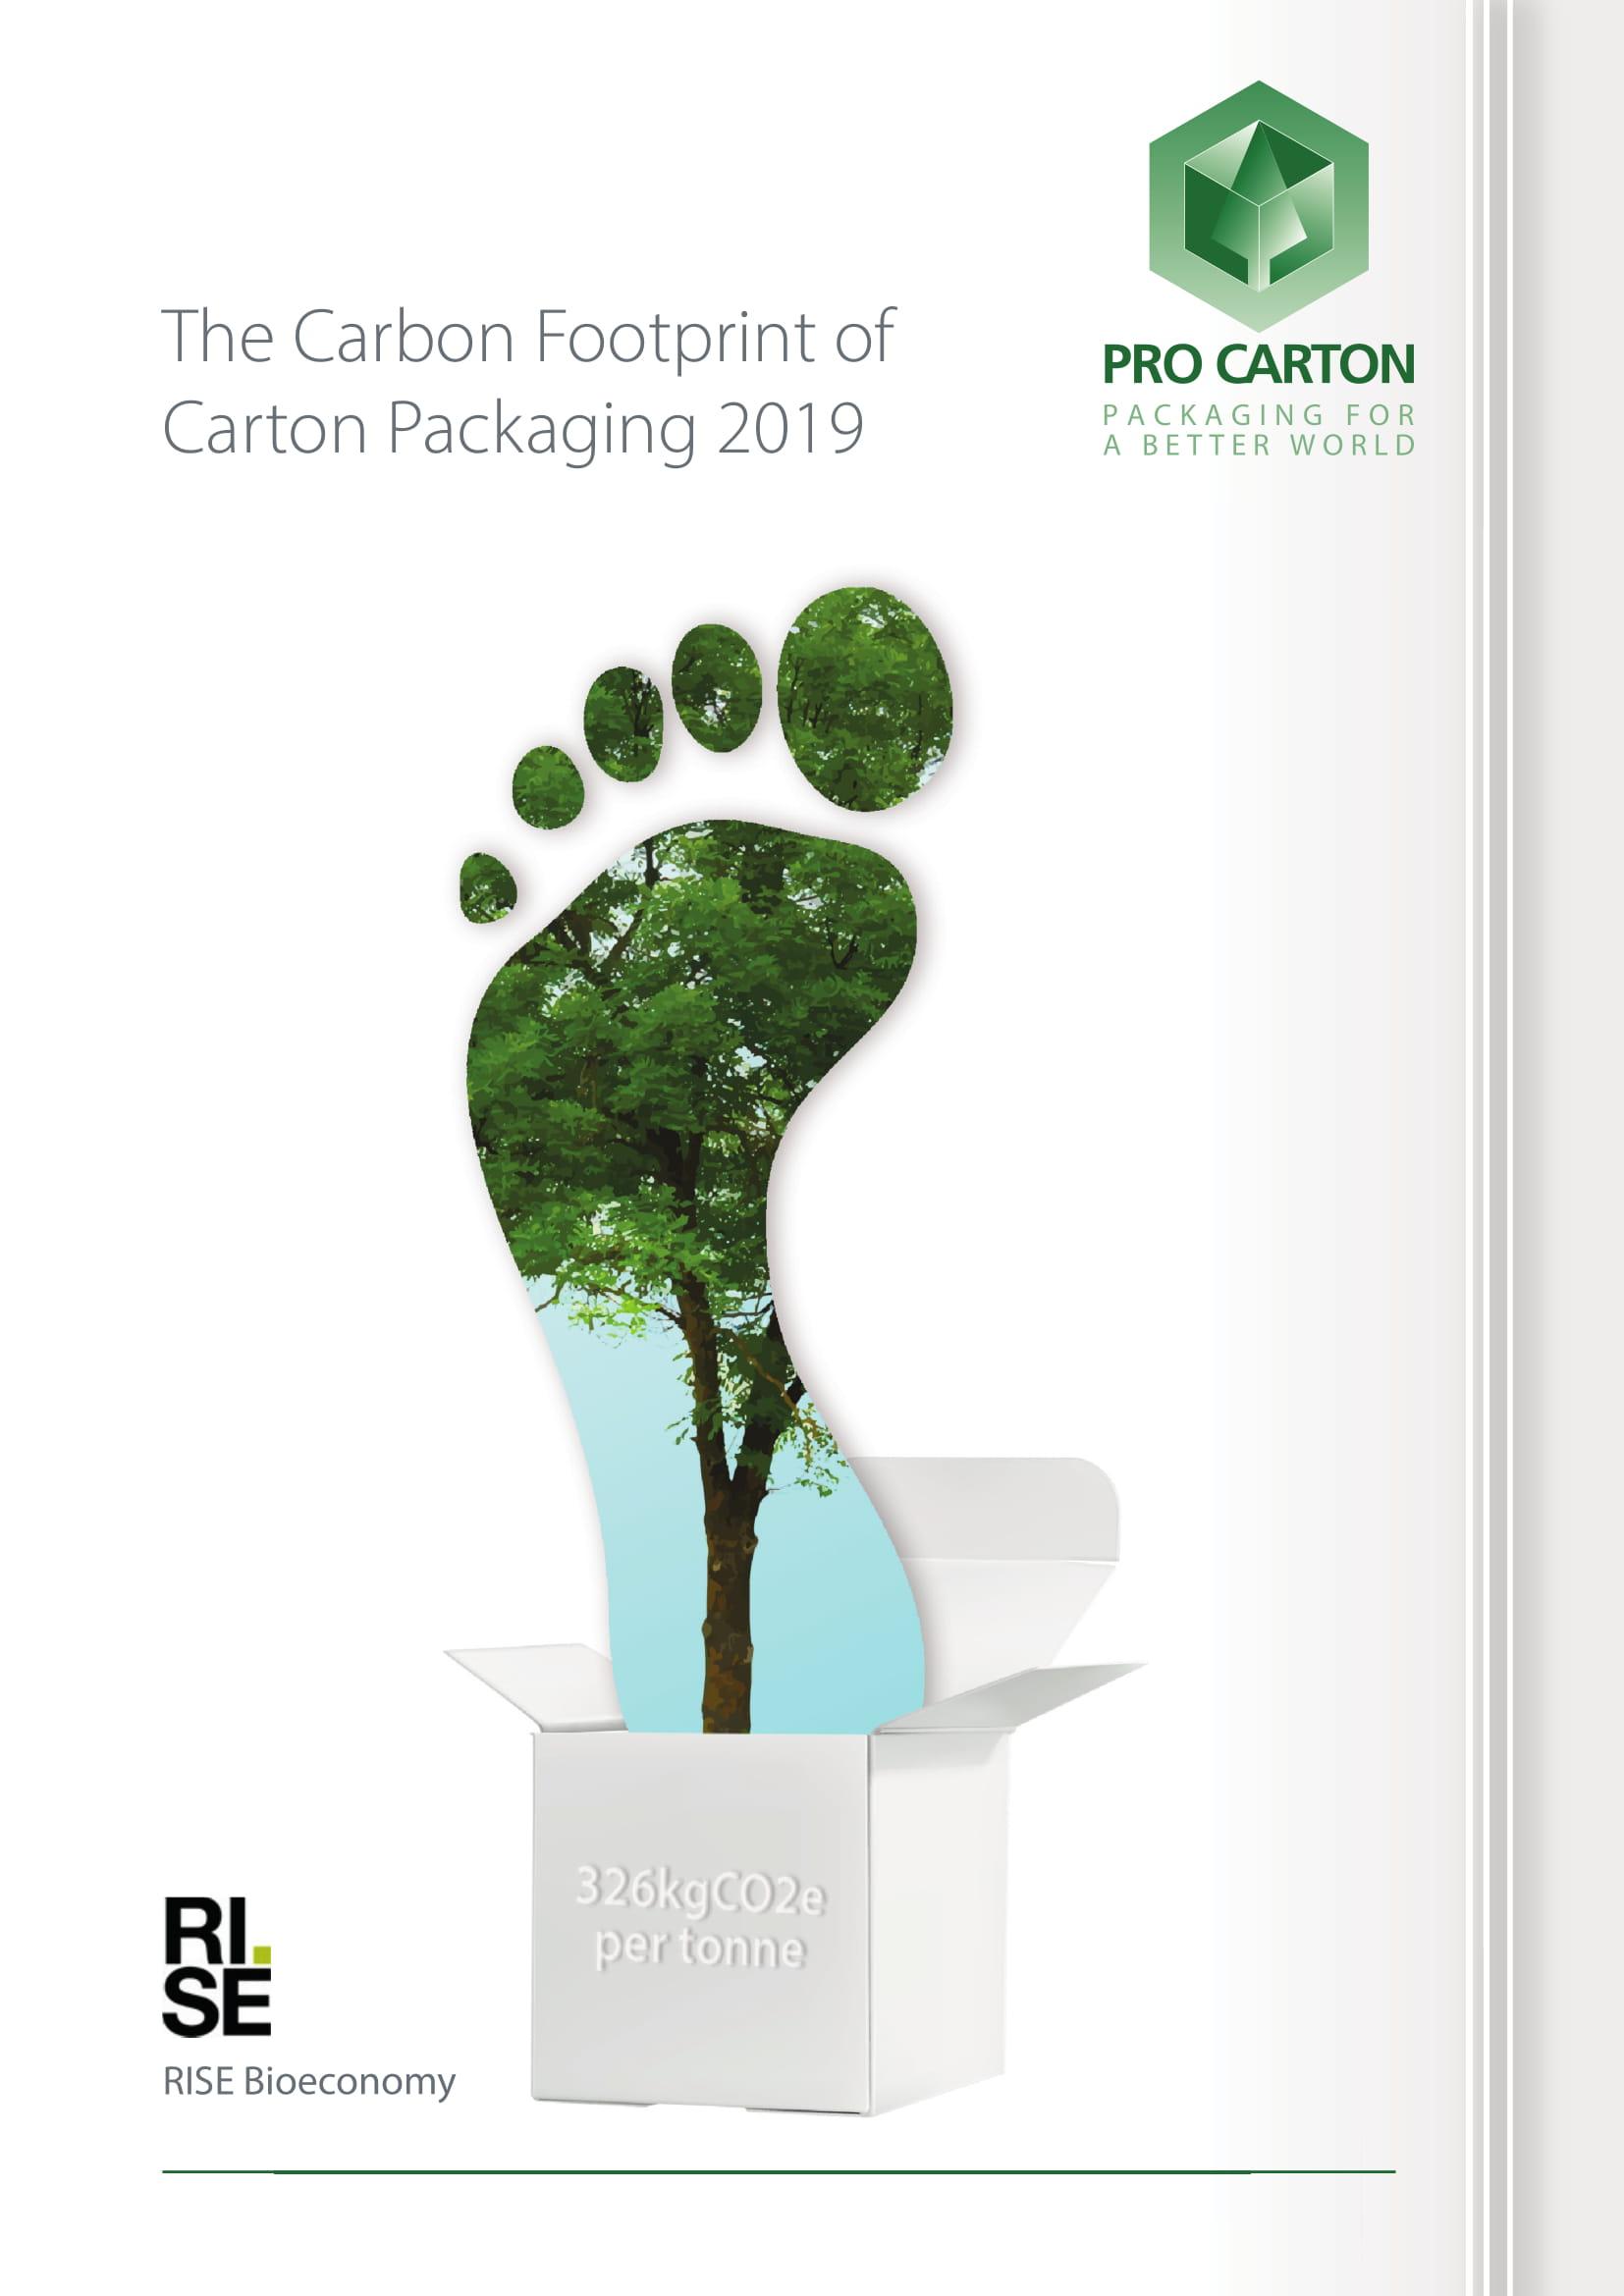 L'Empreinte Carbone des Emballages en Carton 2019 Synthèse